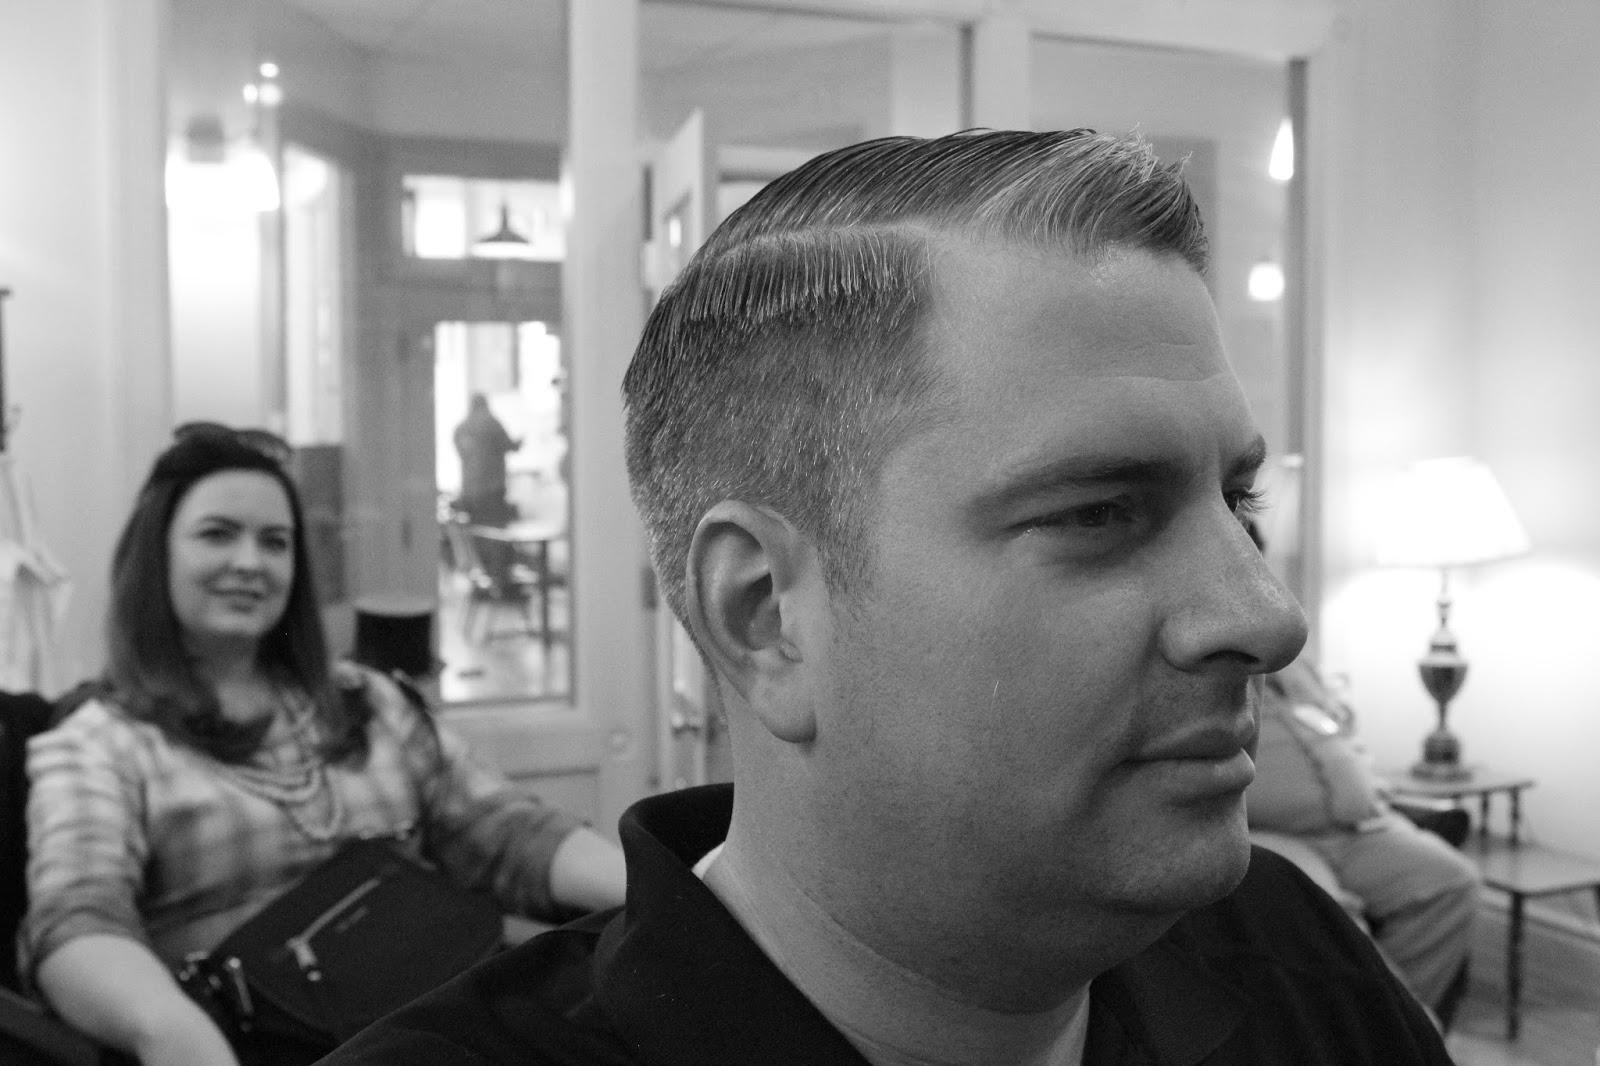 Danburry Barber Shop